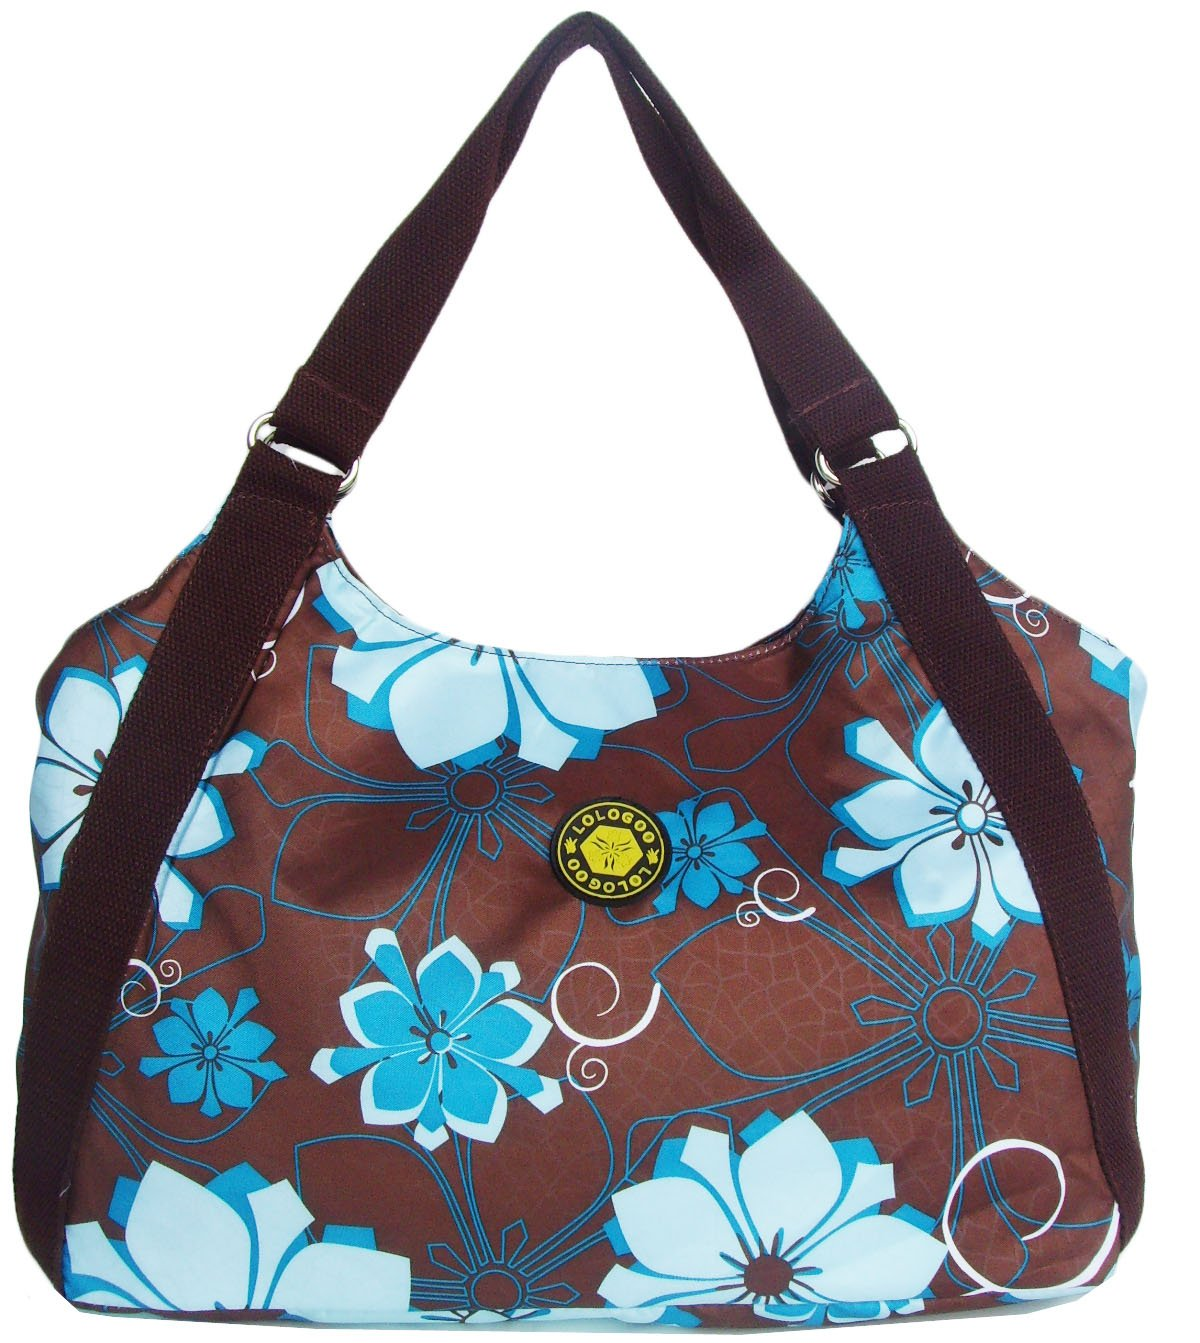 HONG YE Pure Stripe Slouch Bag,sku:hb82brown3